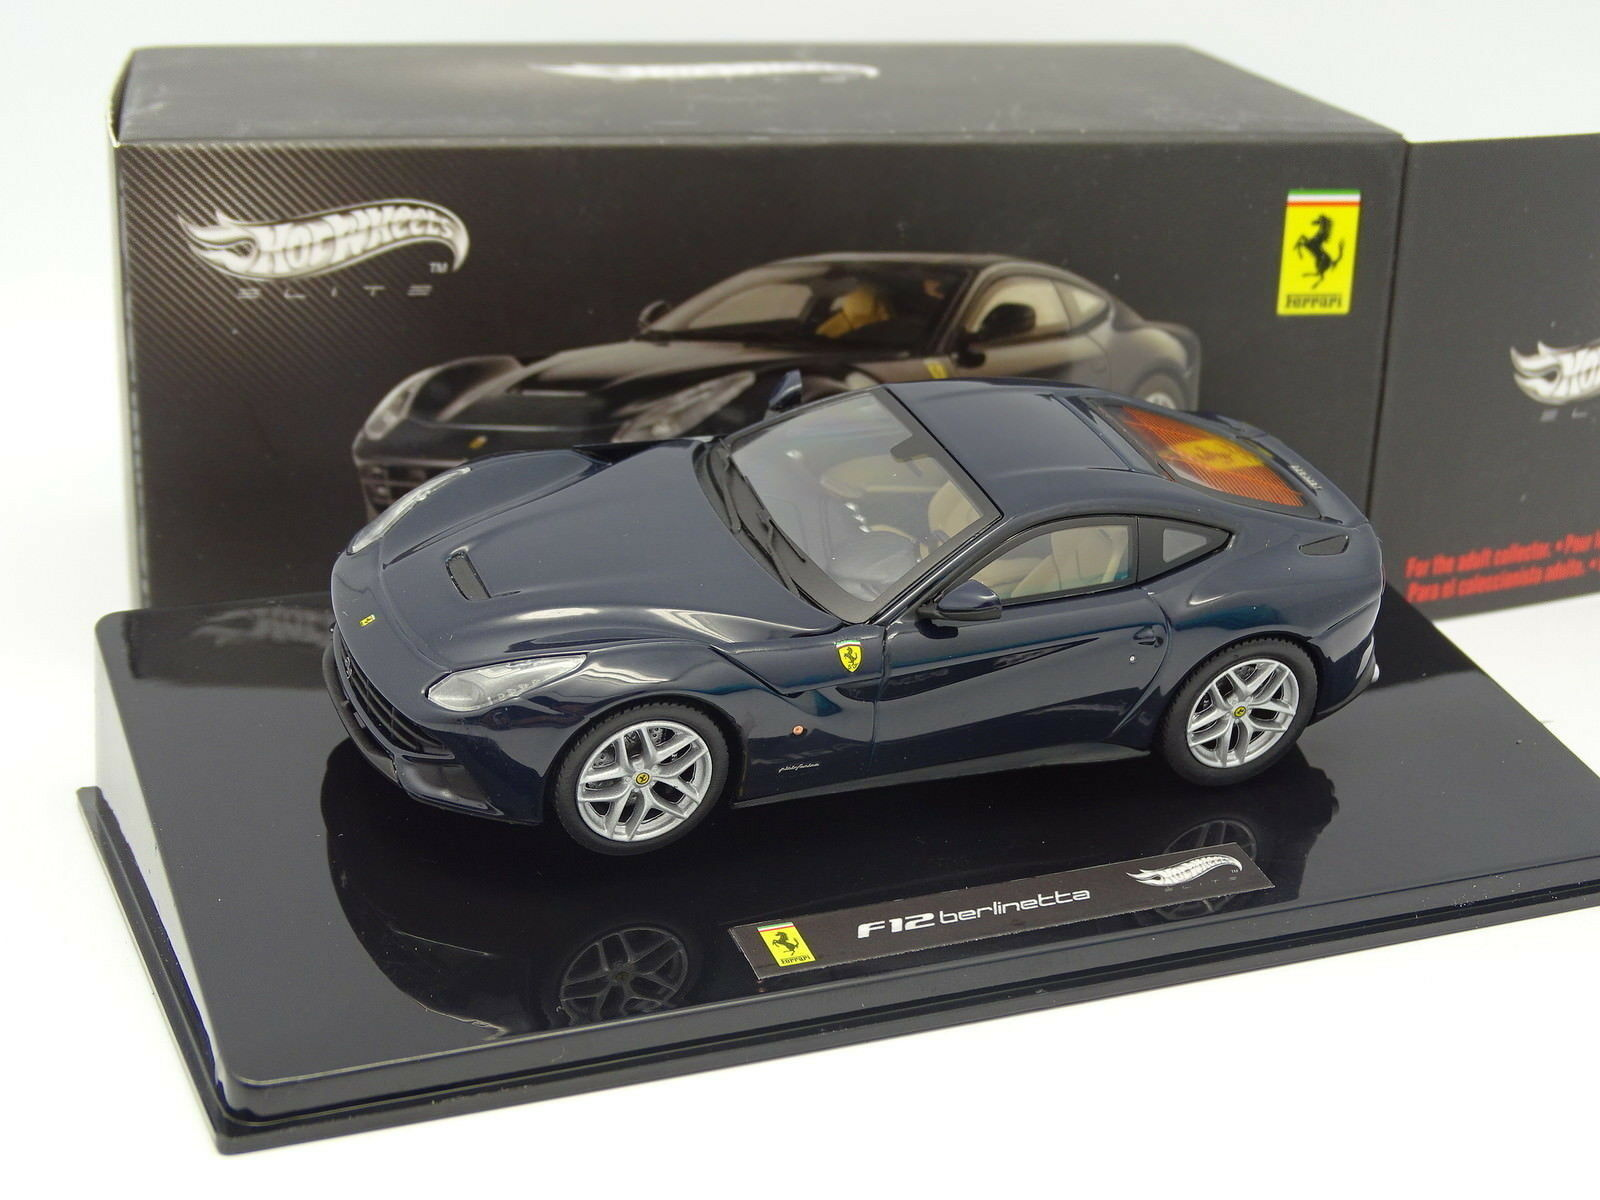 Hot Wheels  - Ferrari F12 Berlinetta blue